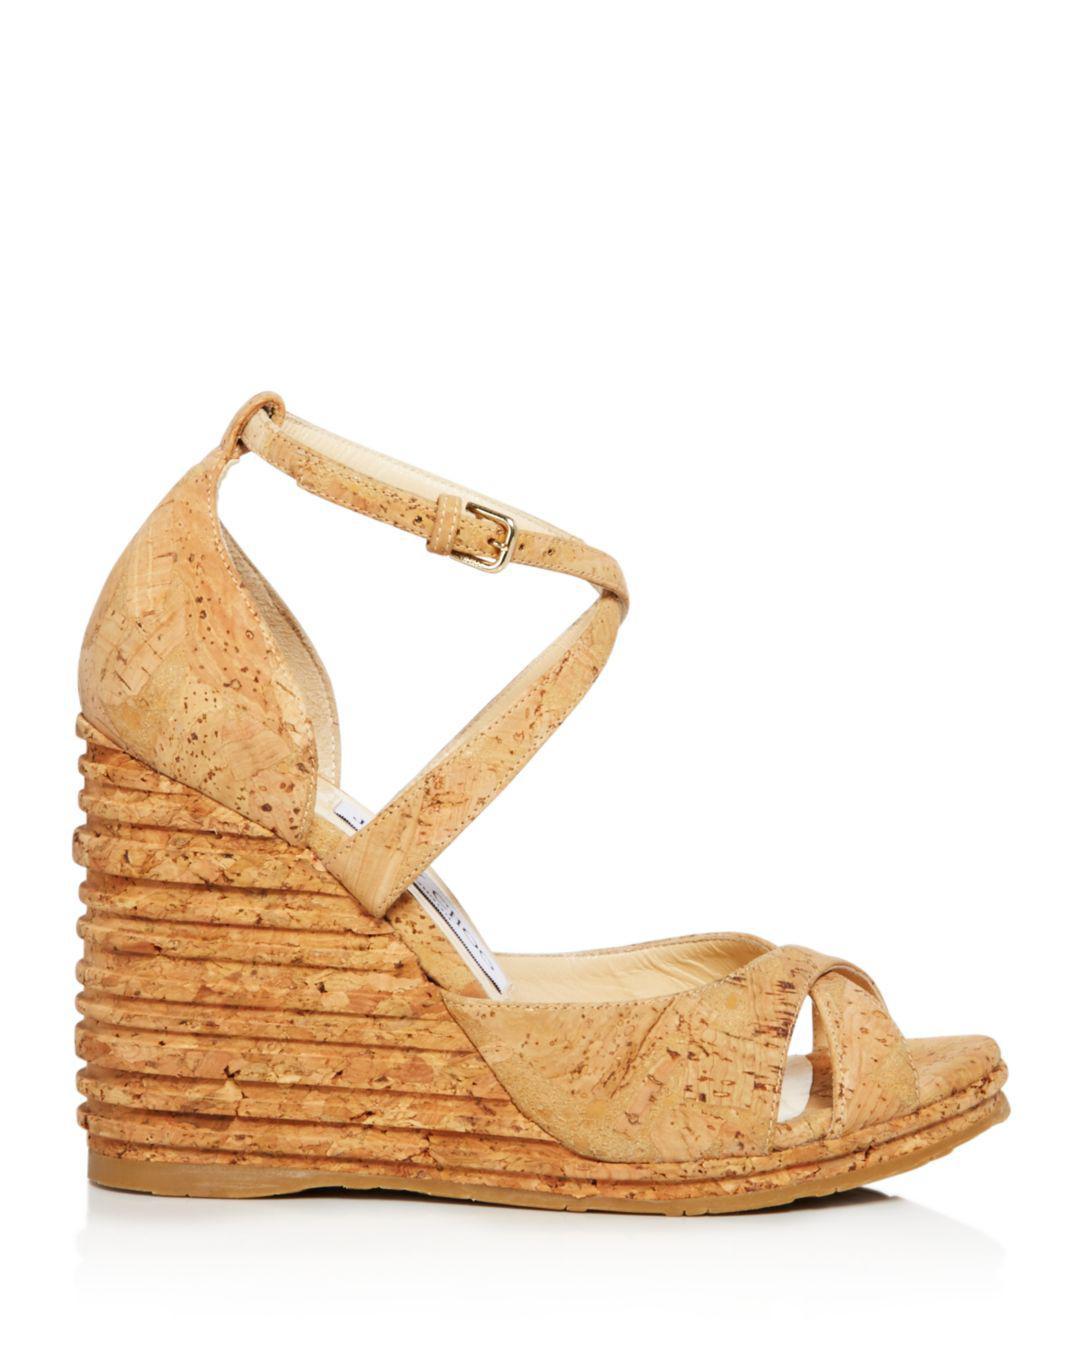 06b61734b80 Jimmy Choo Women s Alanah 105 Cork Platform Wedge Sandals in Natural - Lyst